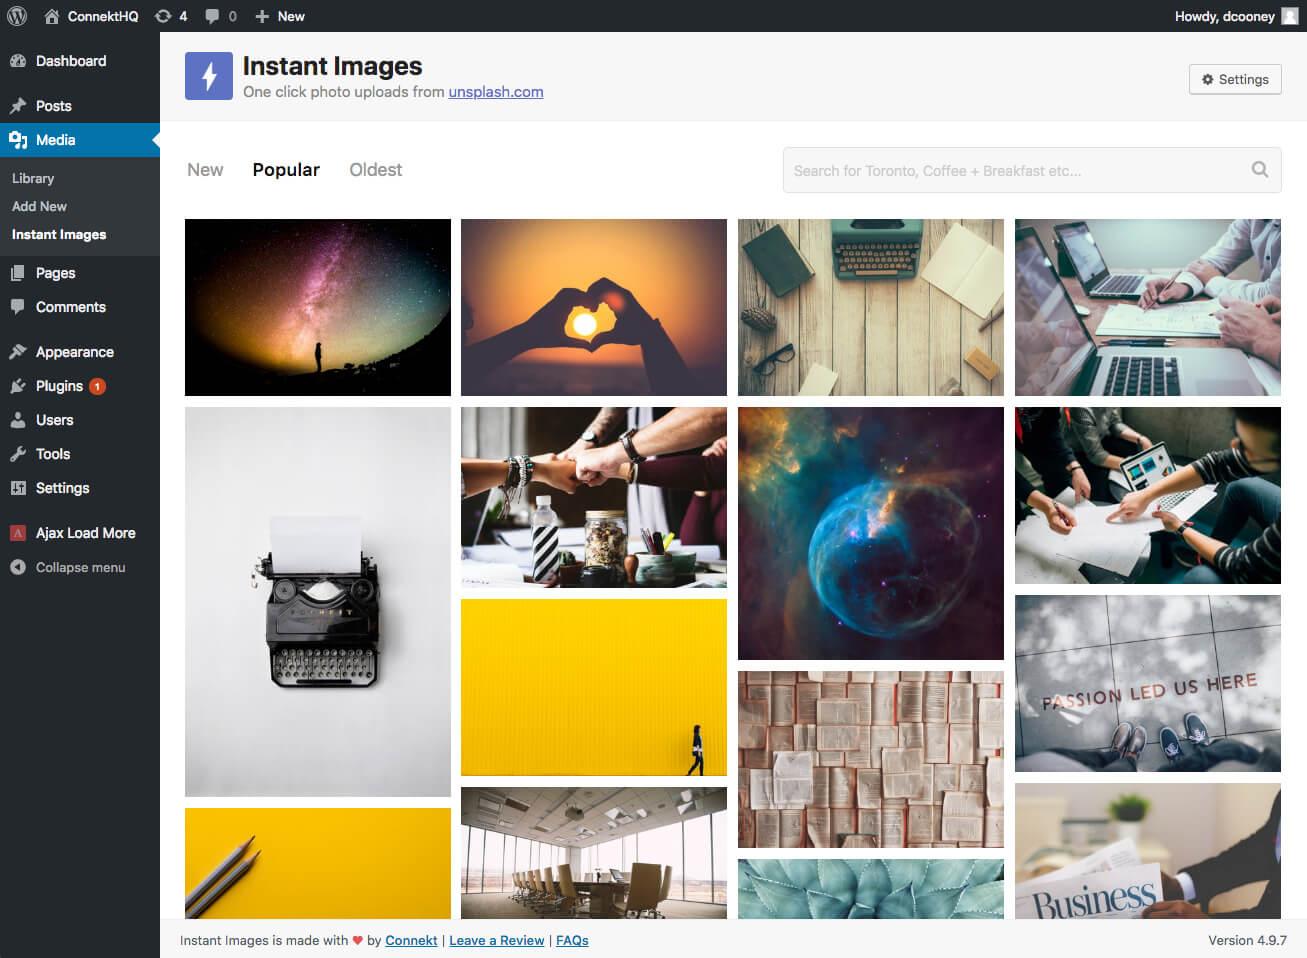 Download Instant Images – One Click Unsplash Uploads 3.2.1 – Free WordPress Plugin